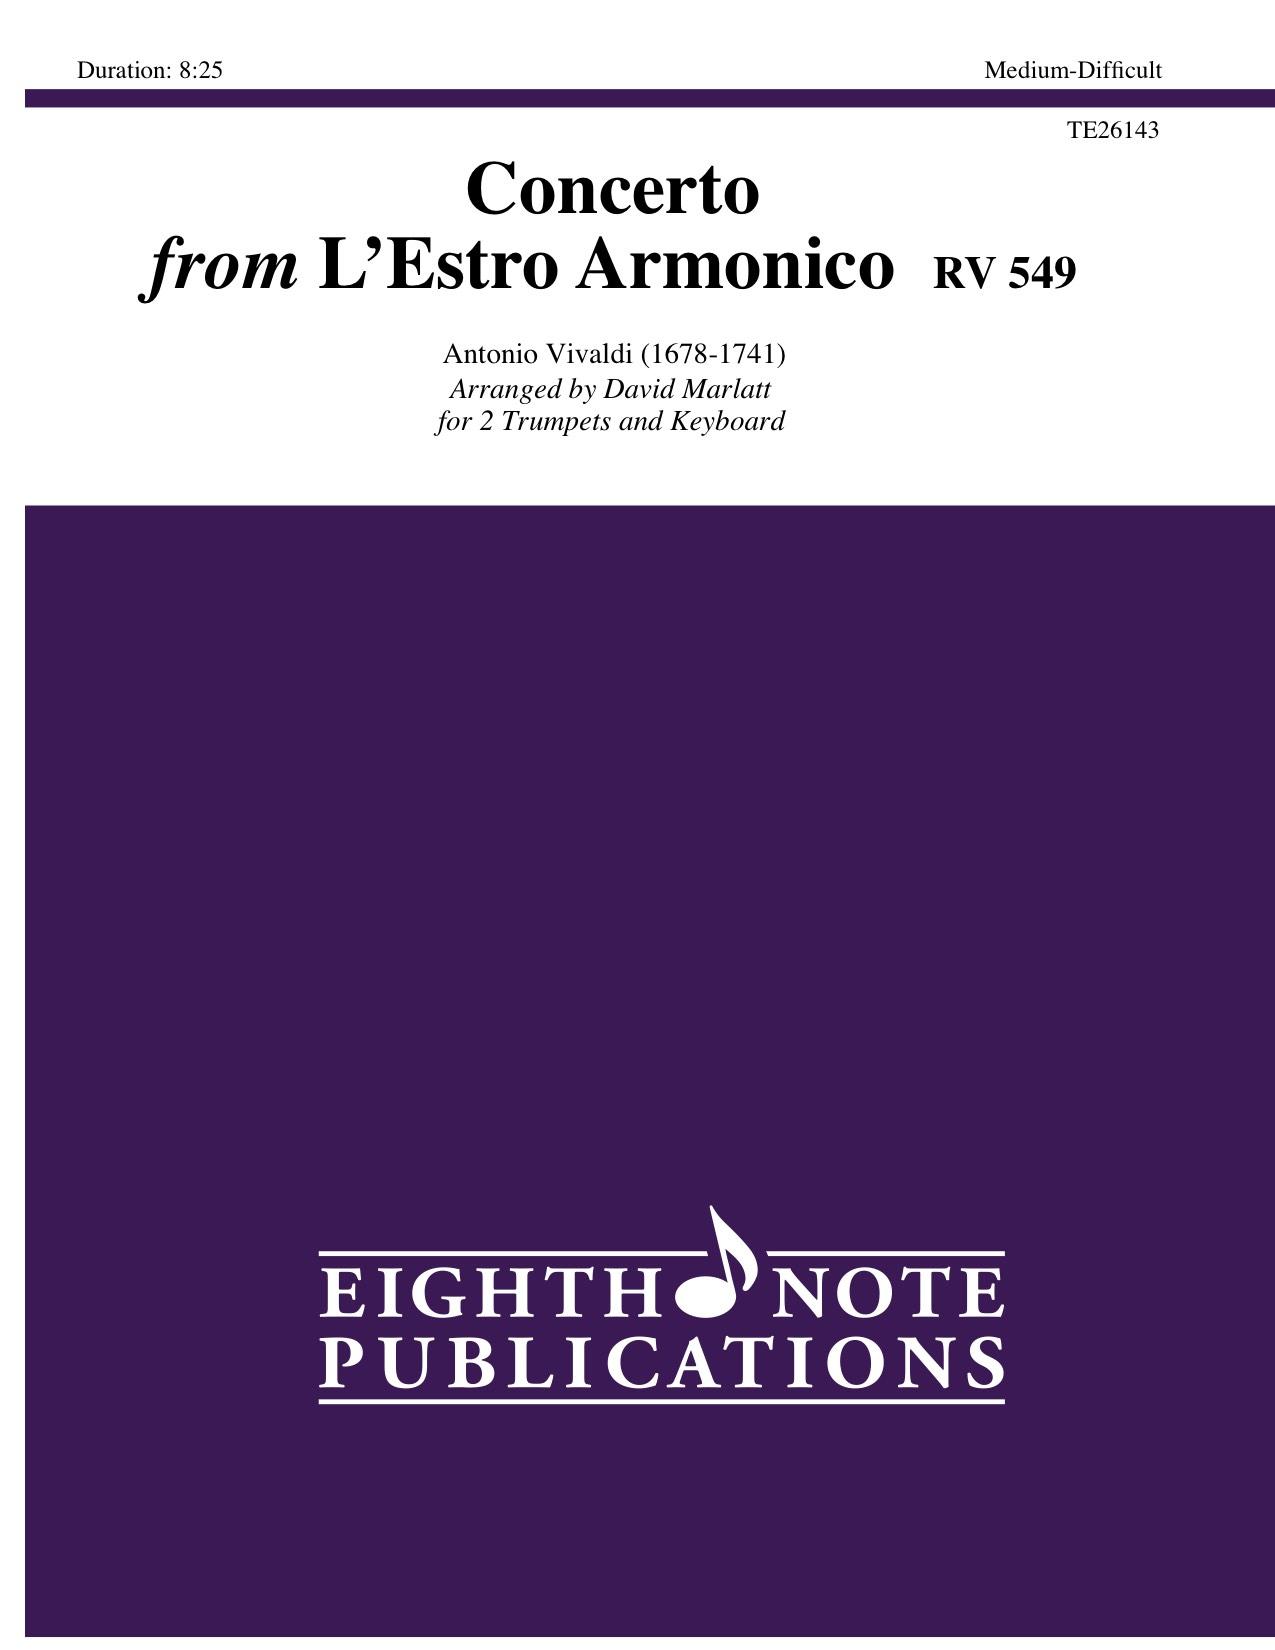 Concerto from LEstro Armonico  RV 549  - Antonio Vivaldi